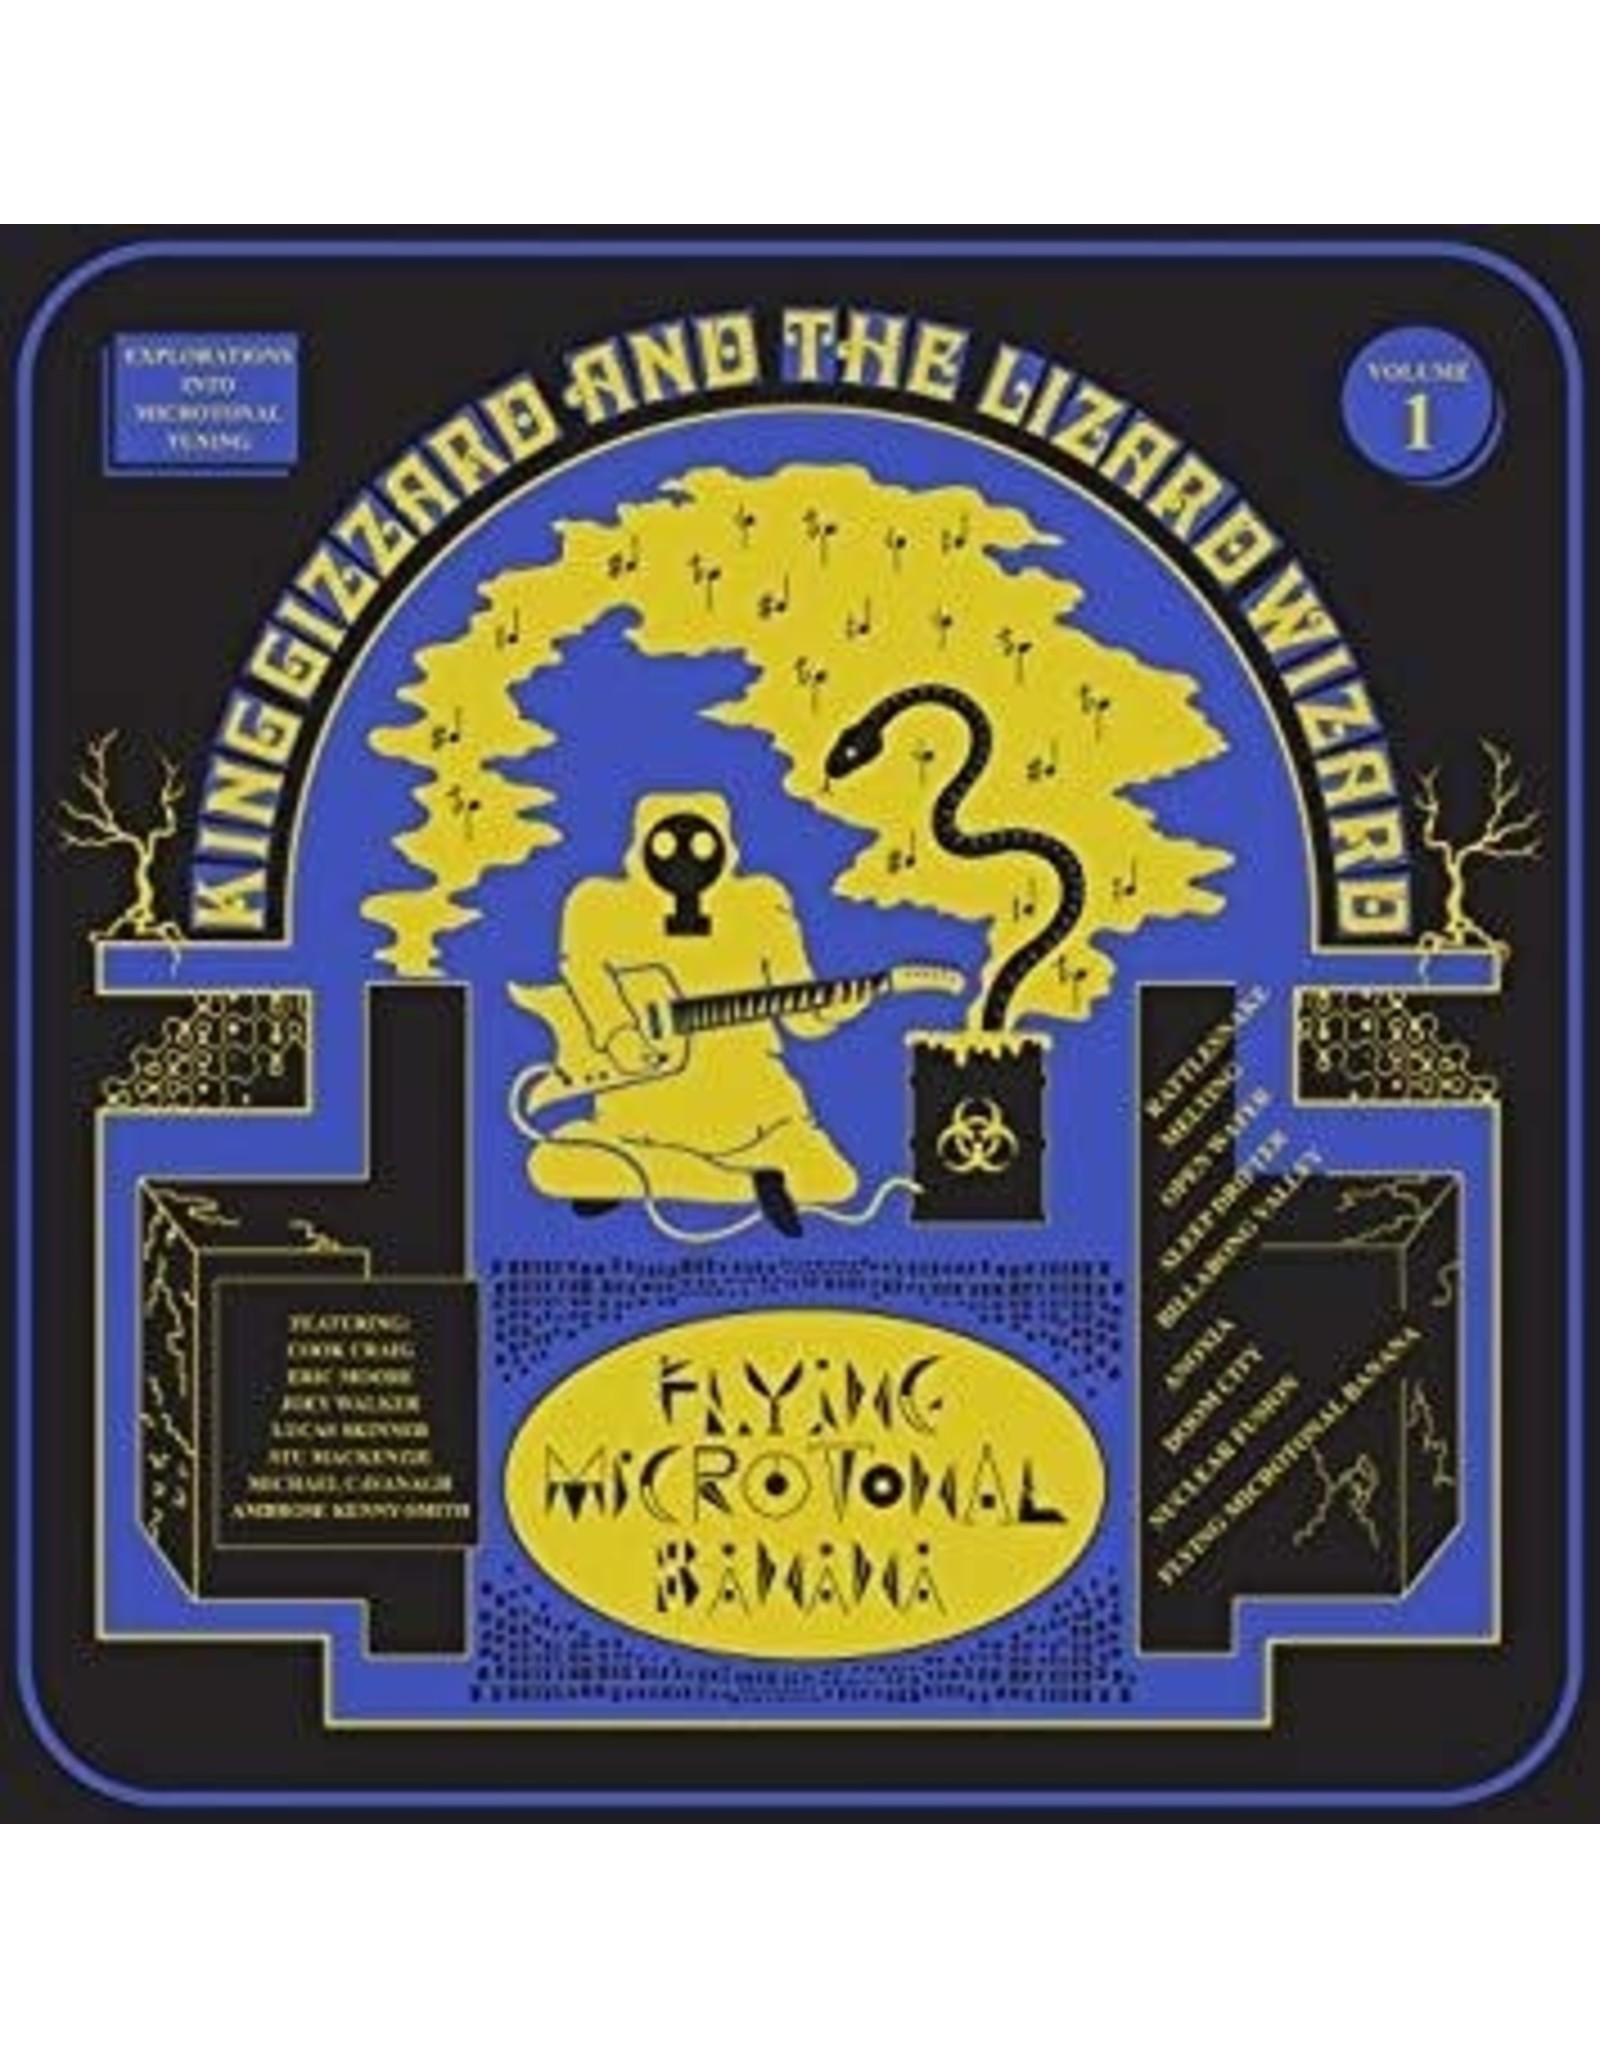 New Vinyl King Gizzard & The Lizard Wizard - Flying Microtonal Banana (Colored) LP